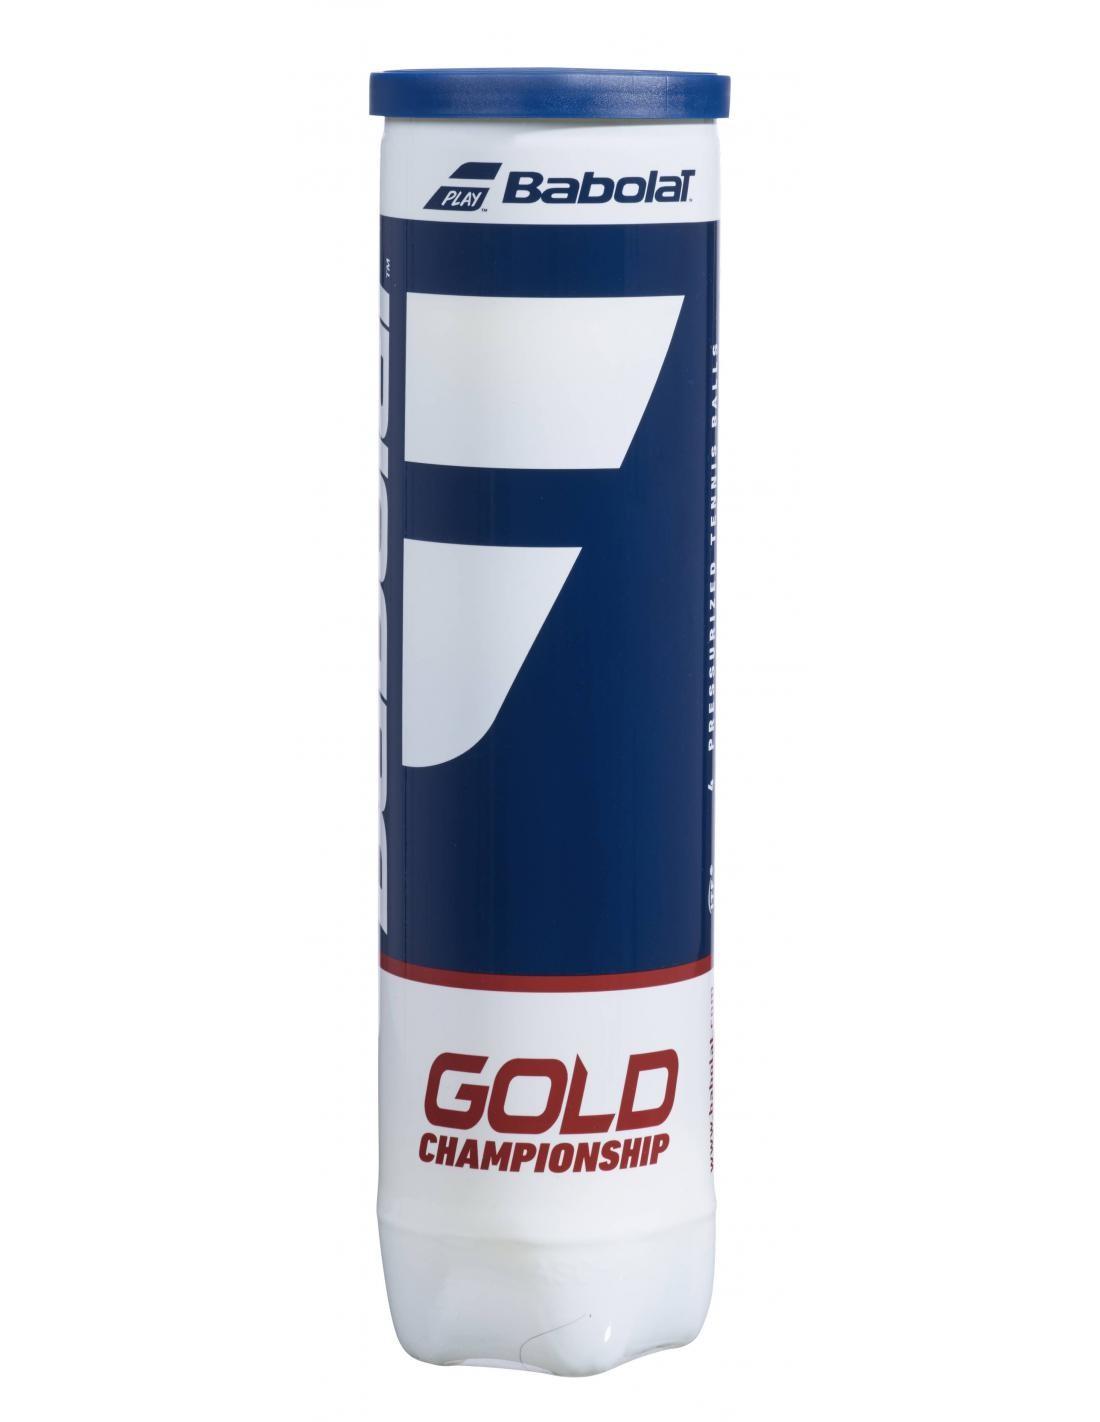 Piłki tenisowe Babolat Gold Championship 4szt